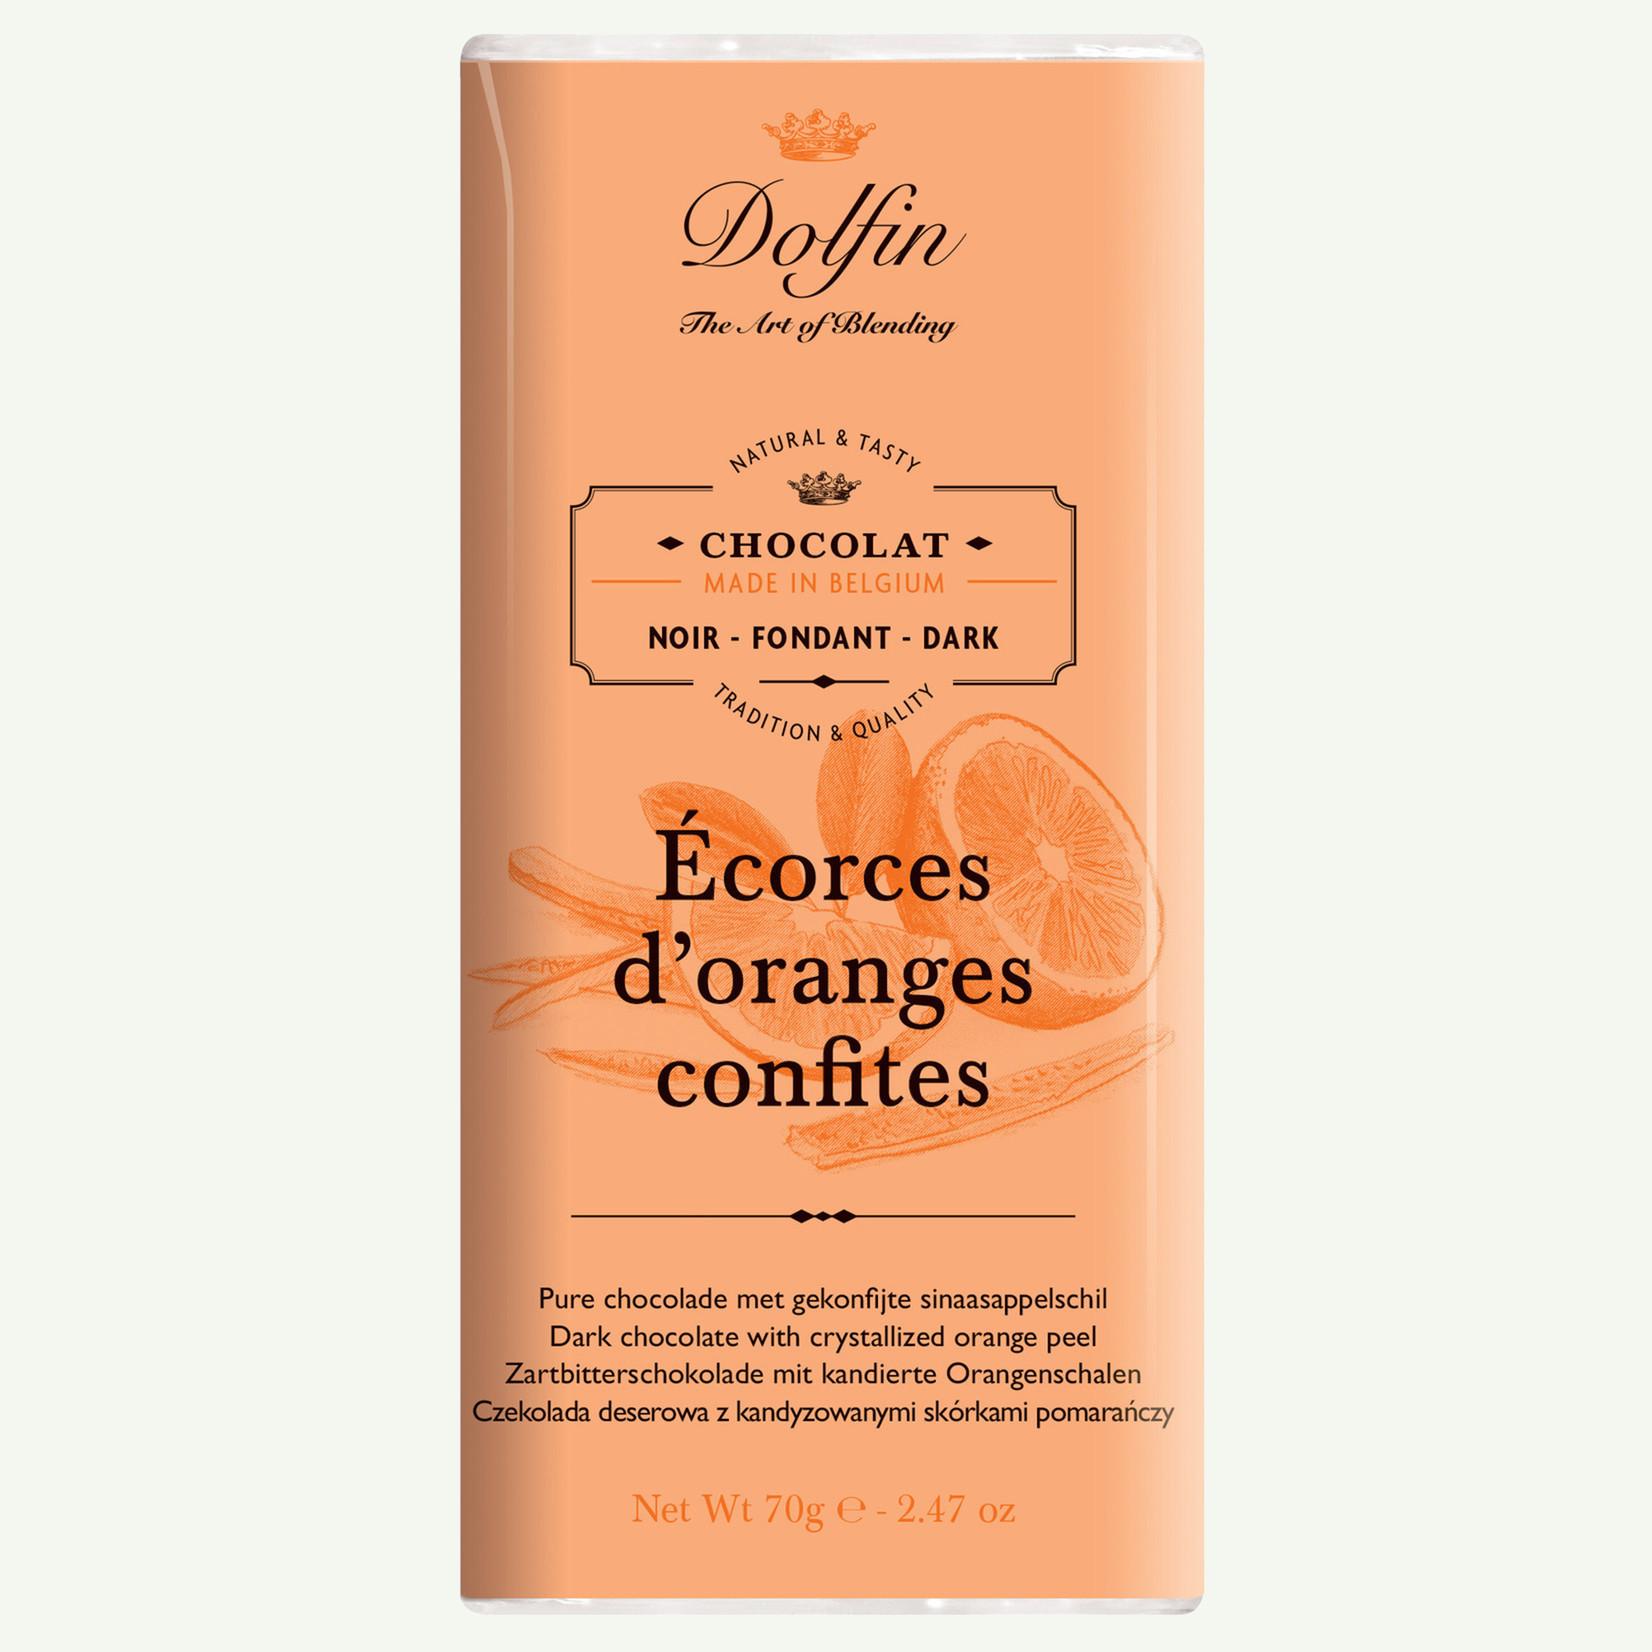 Dolfin Dolfin 'chocoladetablet' - 70g